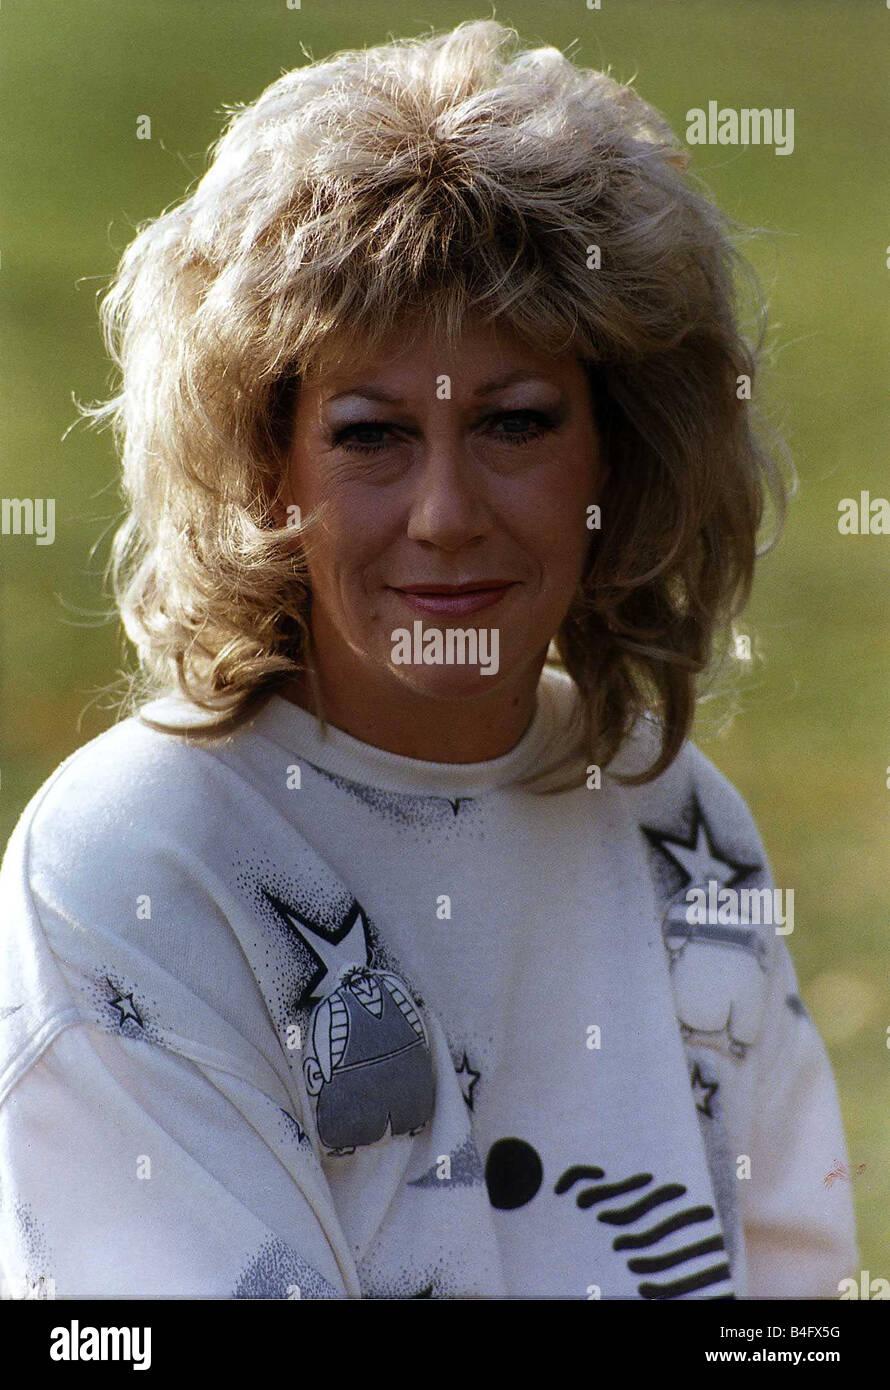 jean ferguson actress dbase mirrorpix stock photo royalty